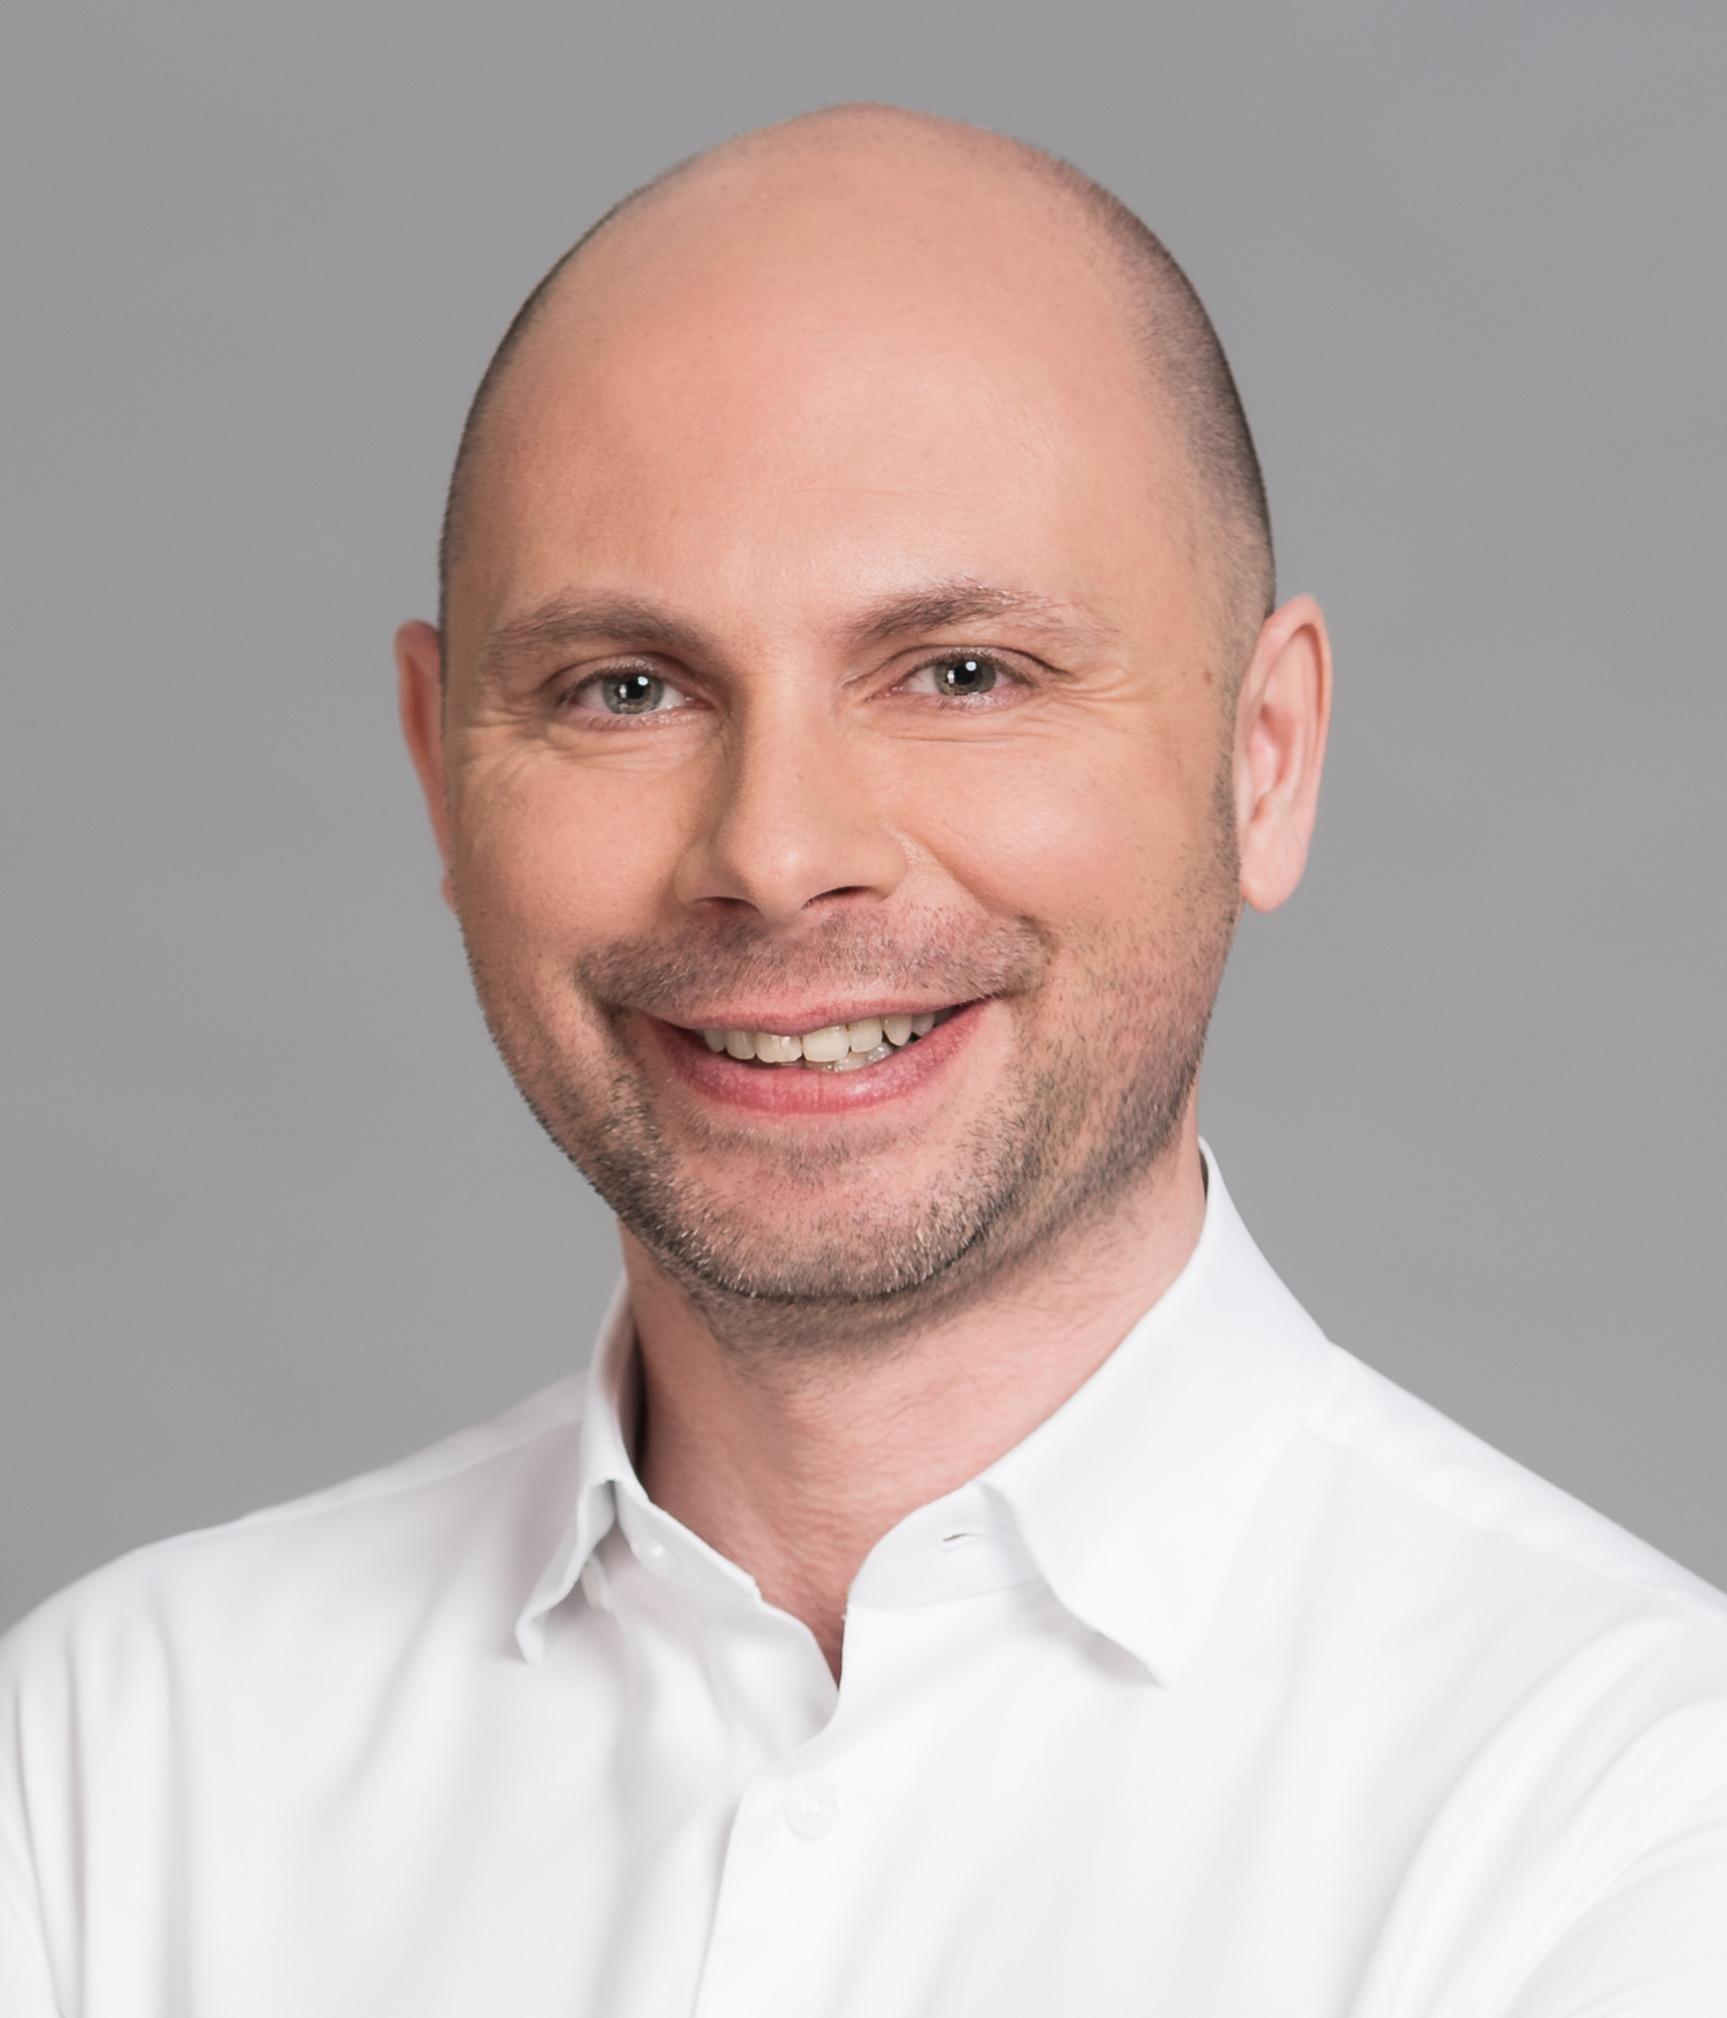 Adam Beniowski